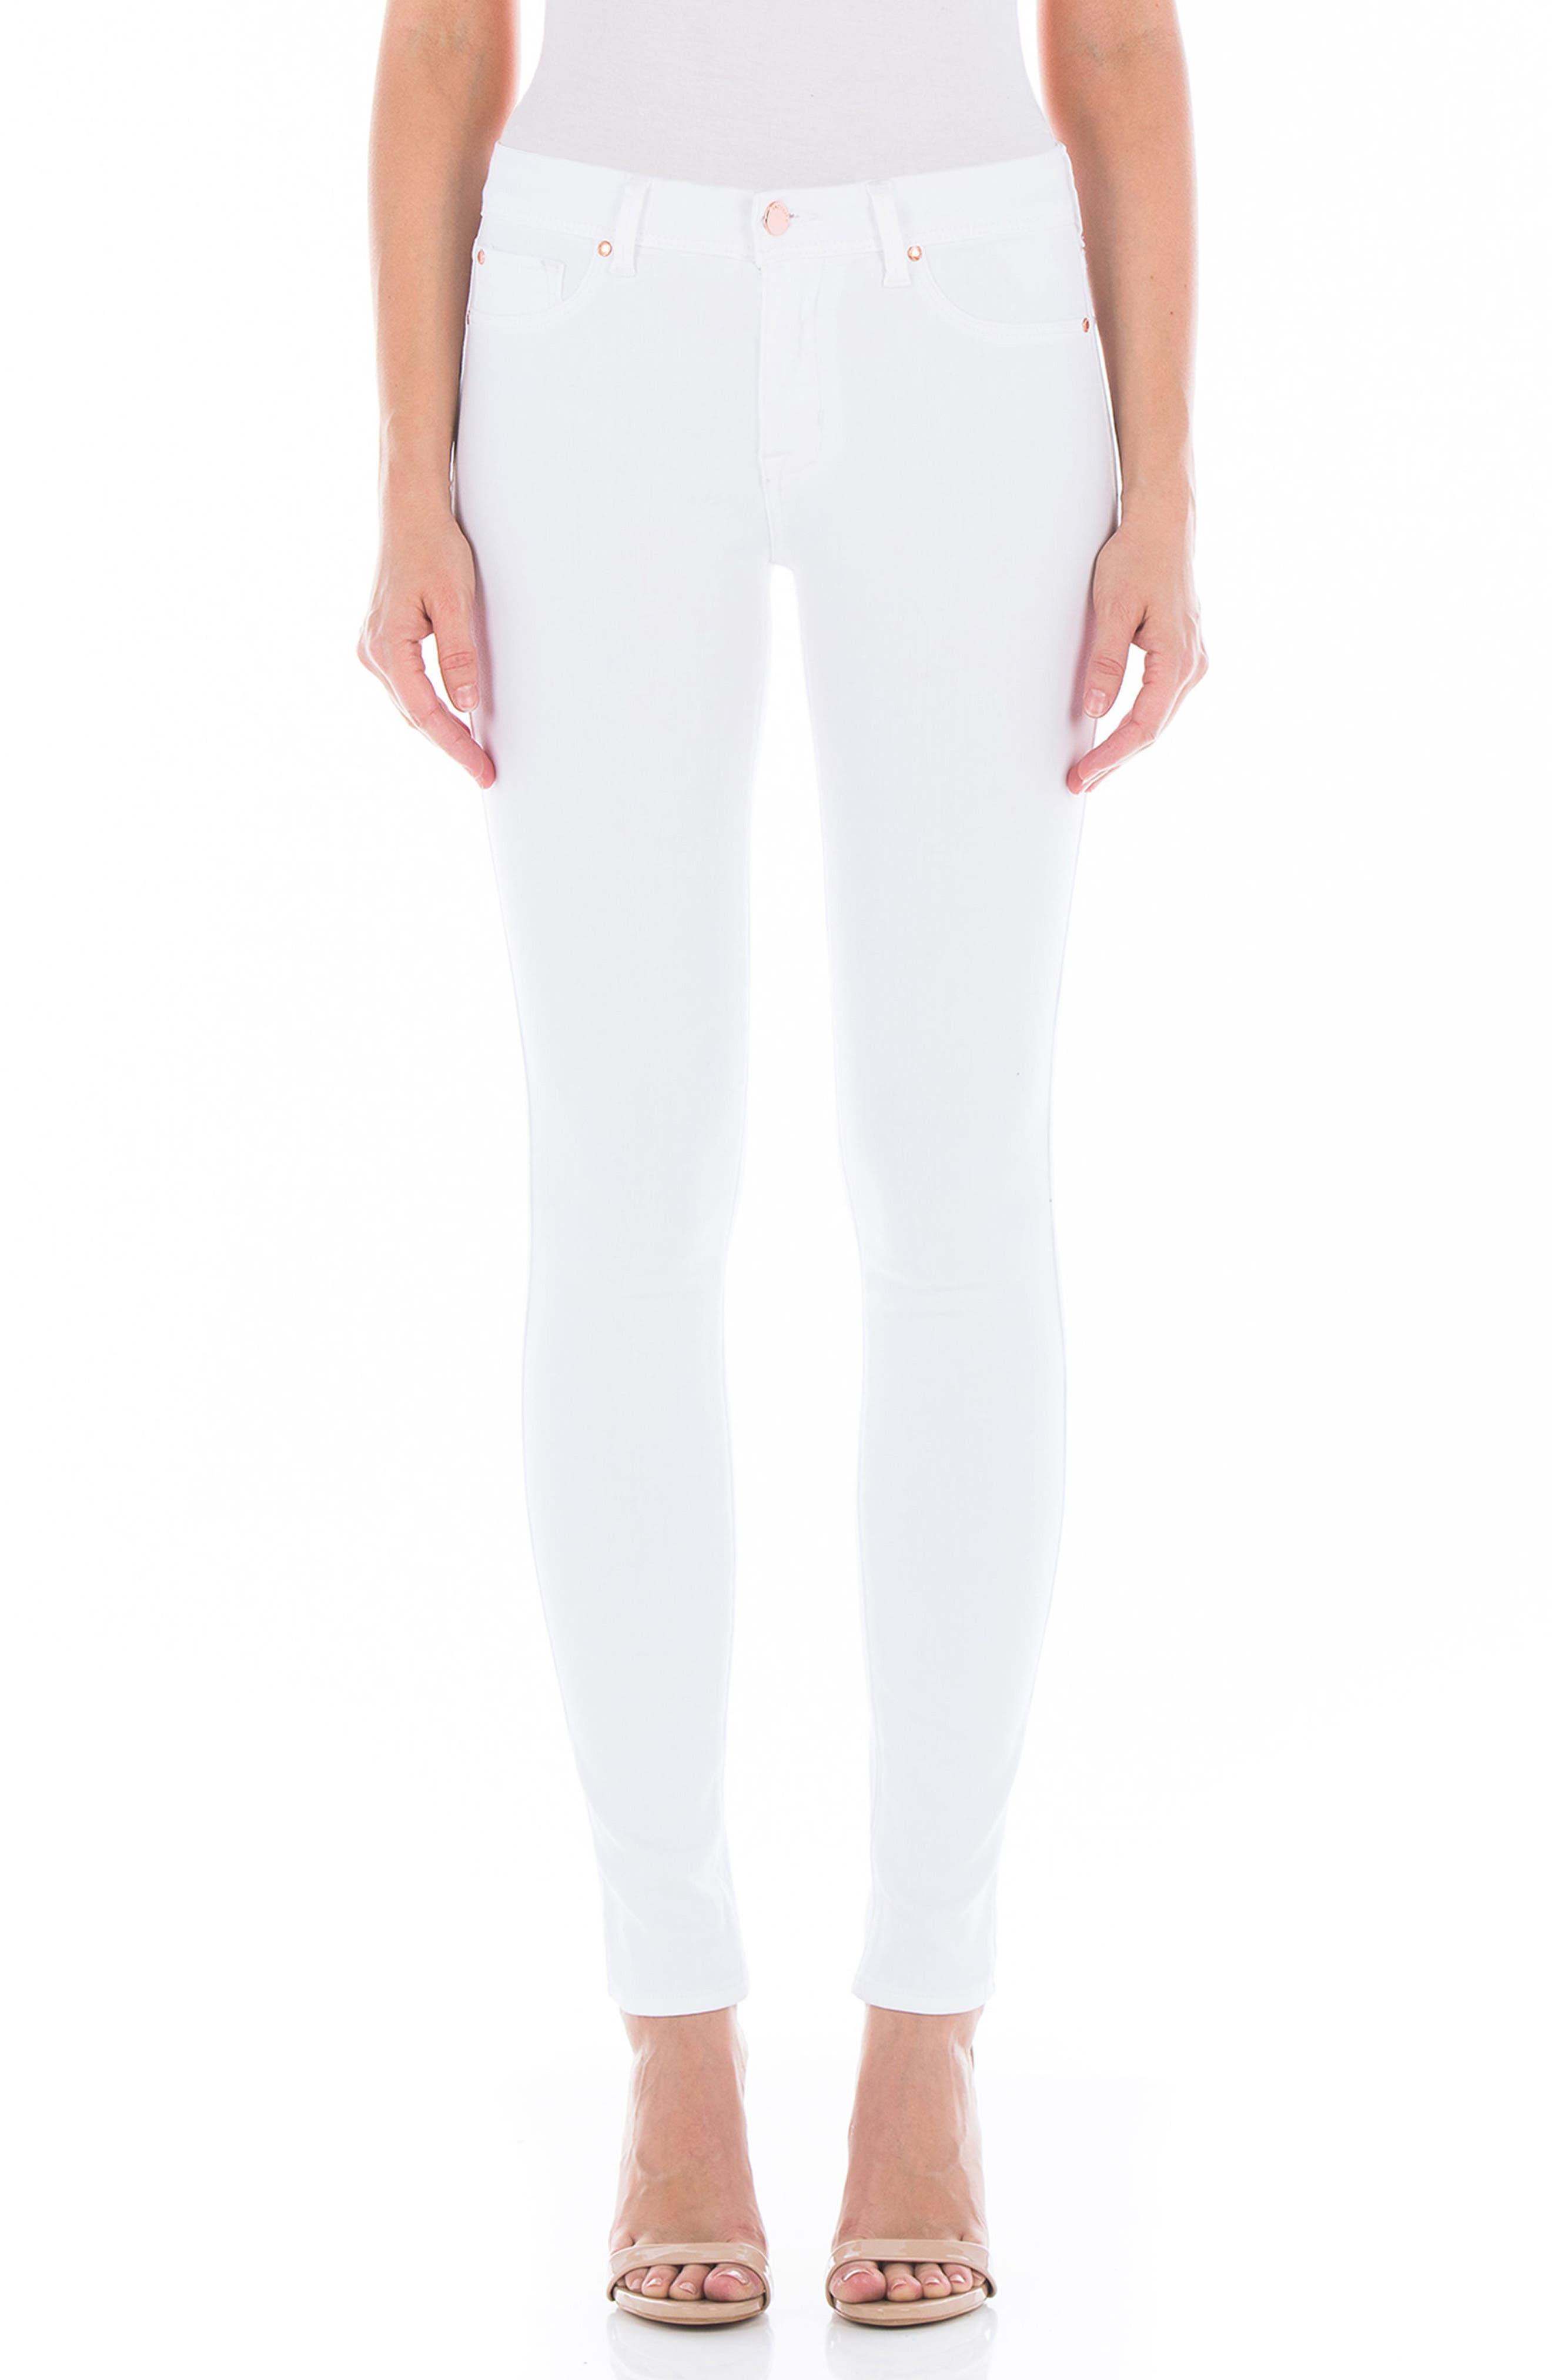 Belvedere Skinny Jeans,                         Main,                         color, White